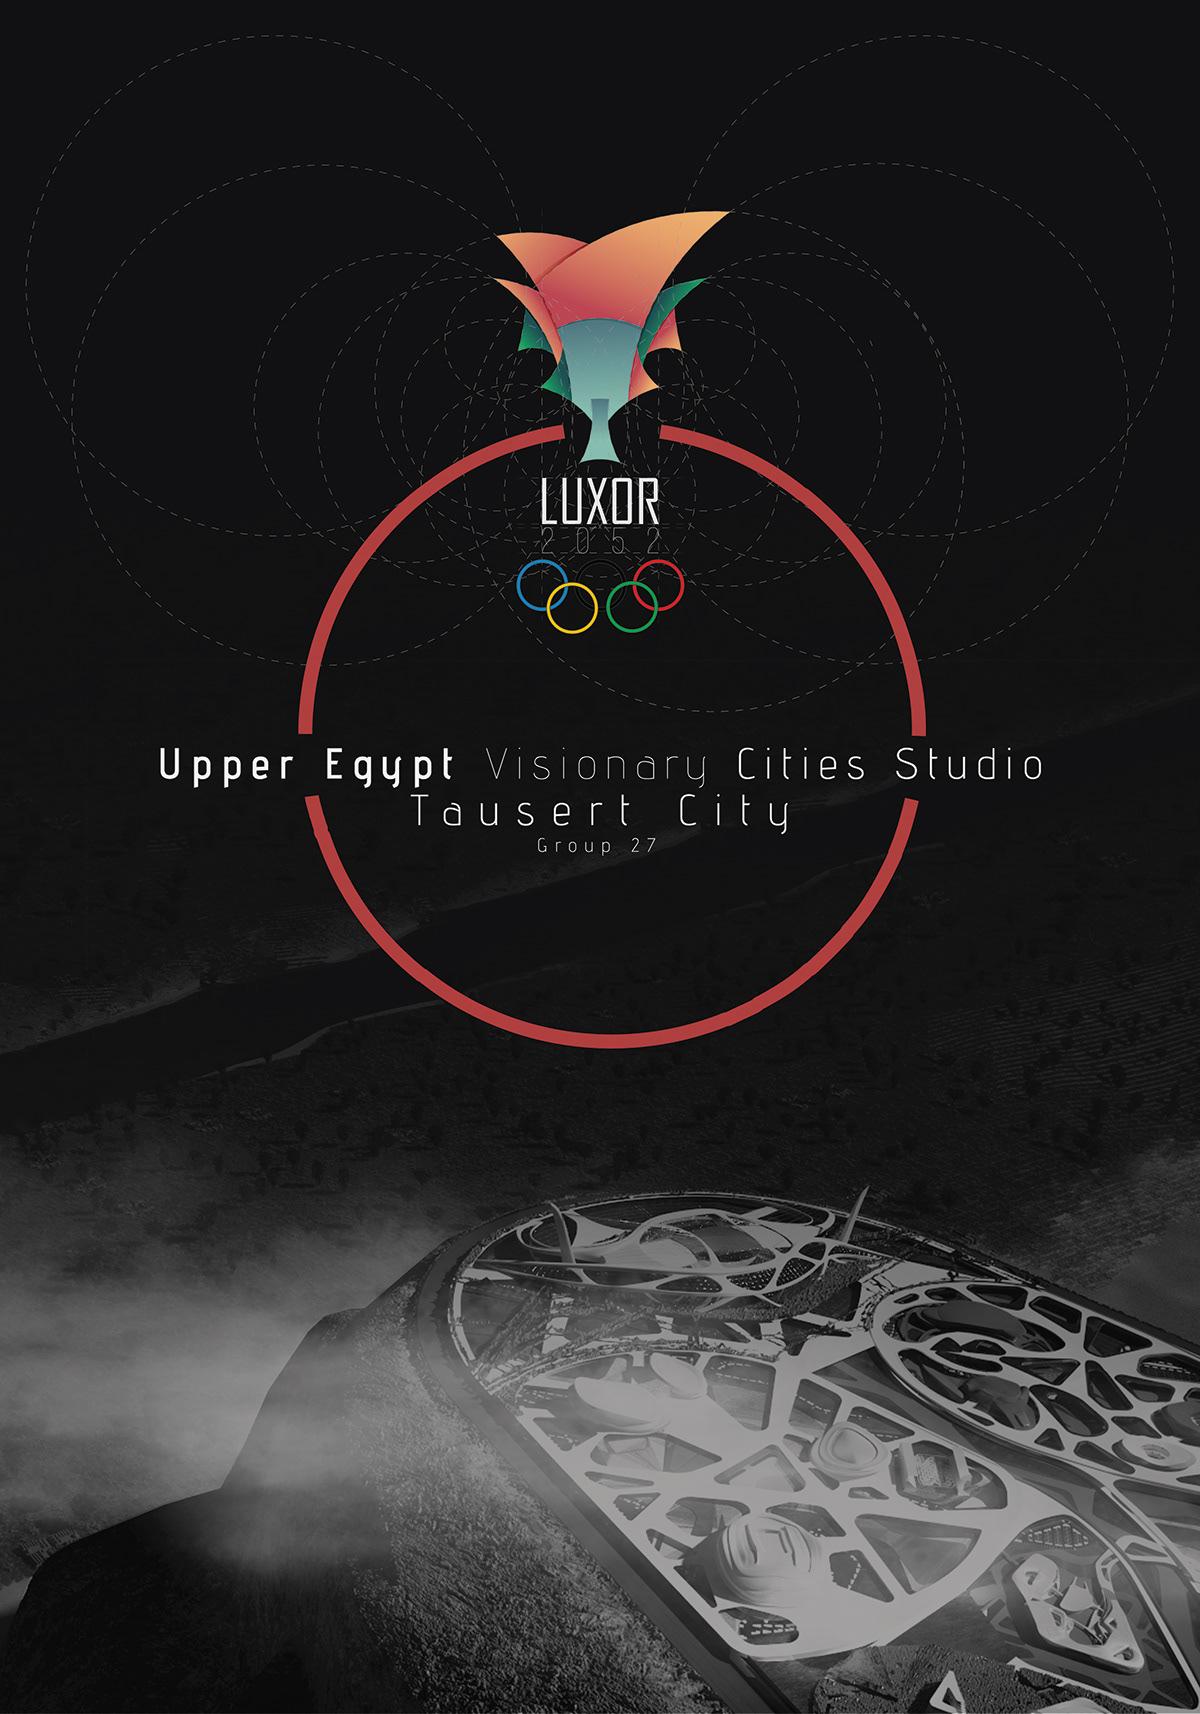 TAUSERT Olympic city, Luxor 2052 - Graduation Project